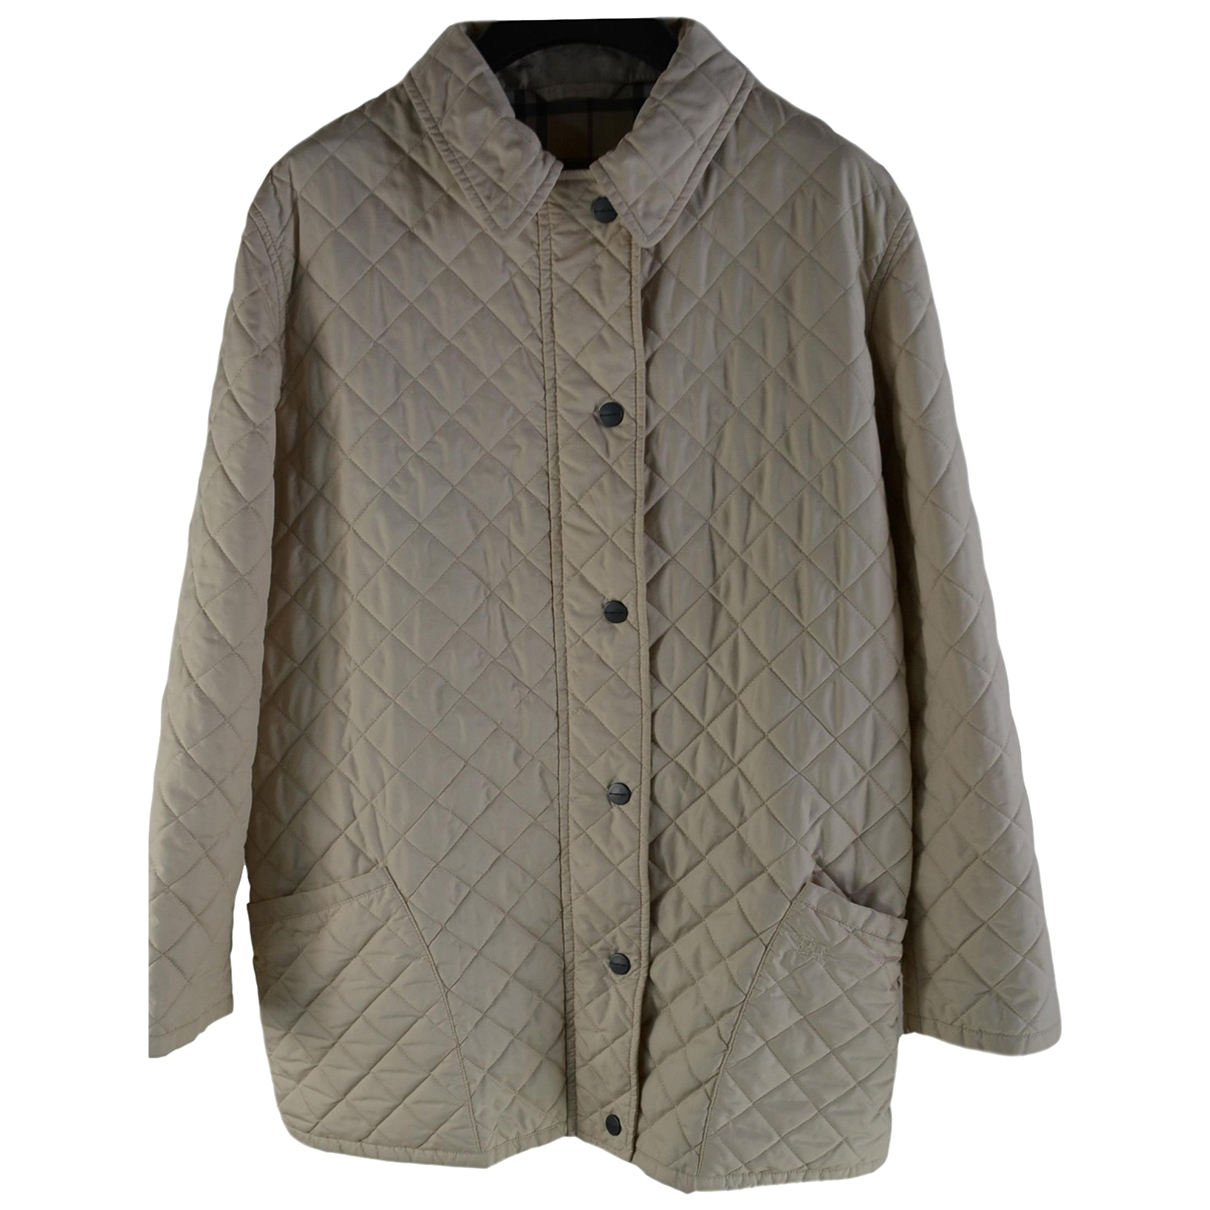 Burberry \N Jacke in  Beige Polyester